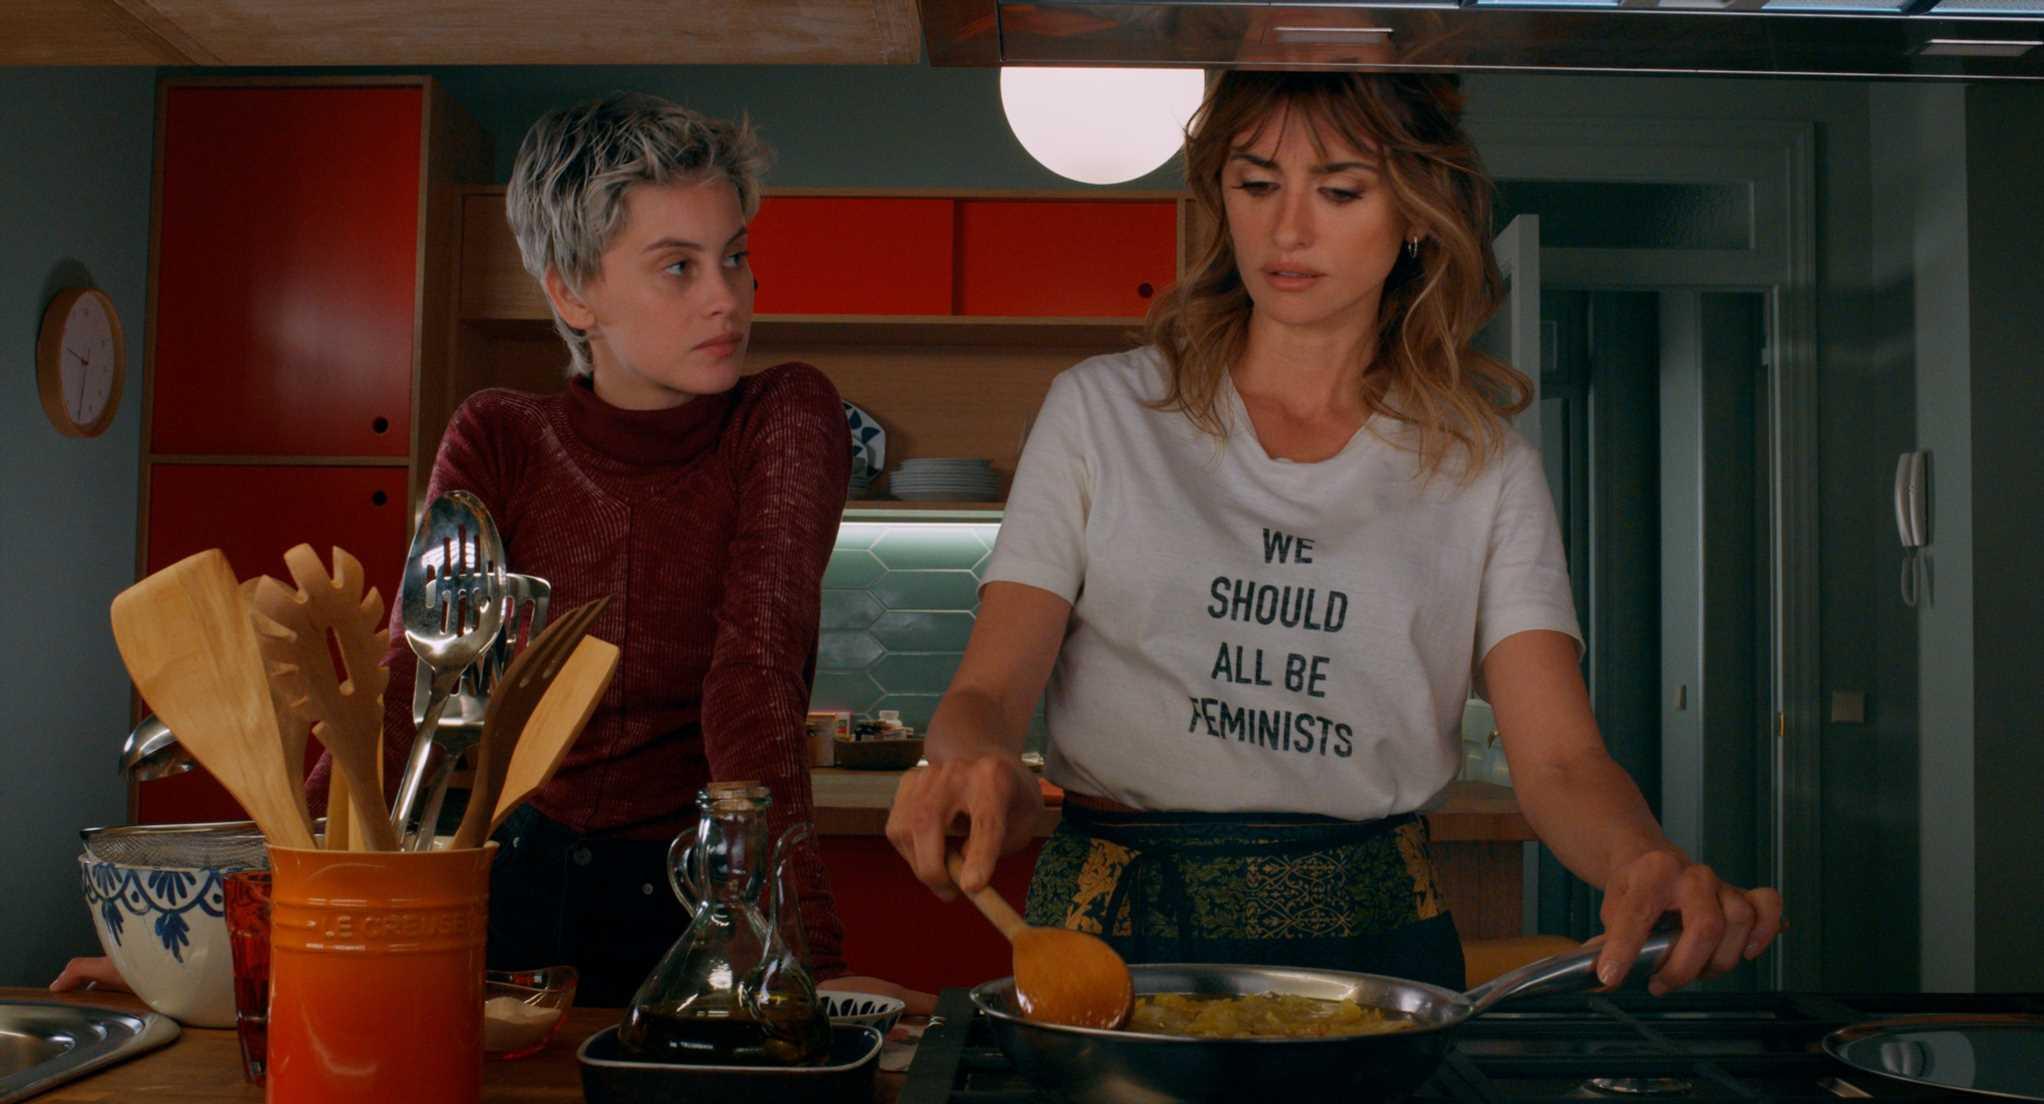 Penélope Cruz rescata la camiseta feminista viral de Dior